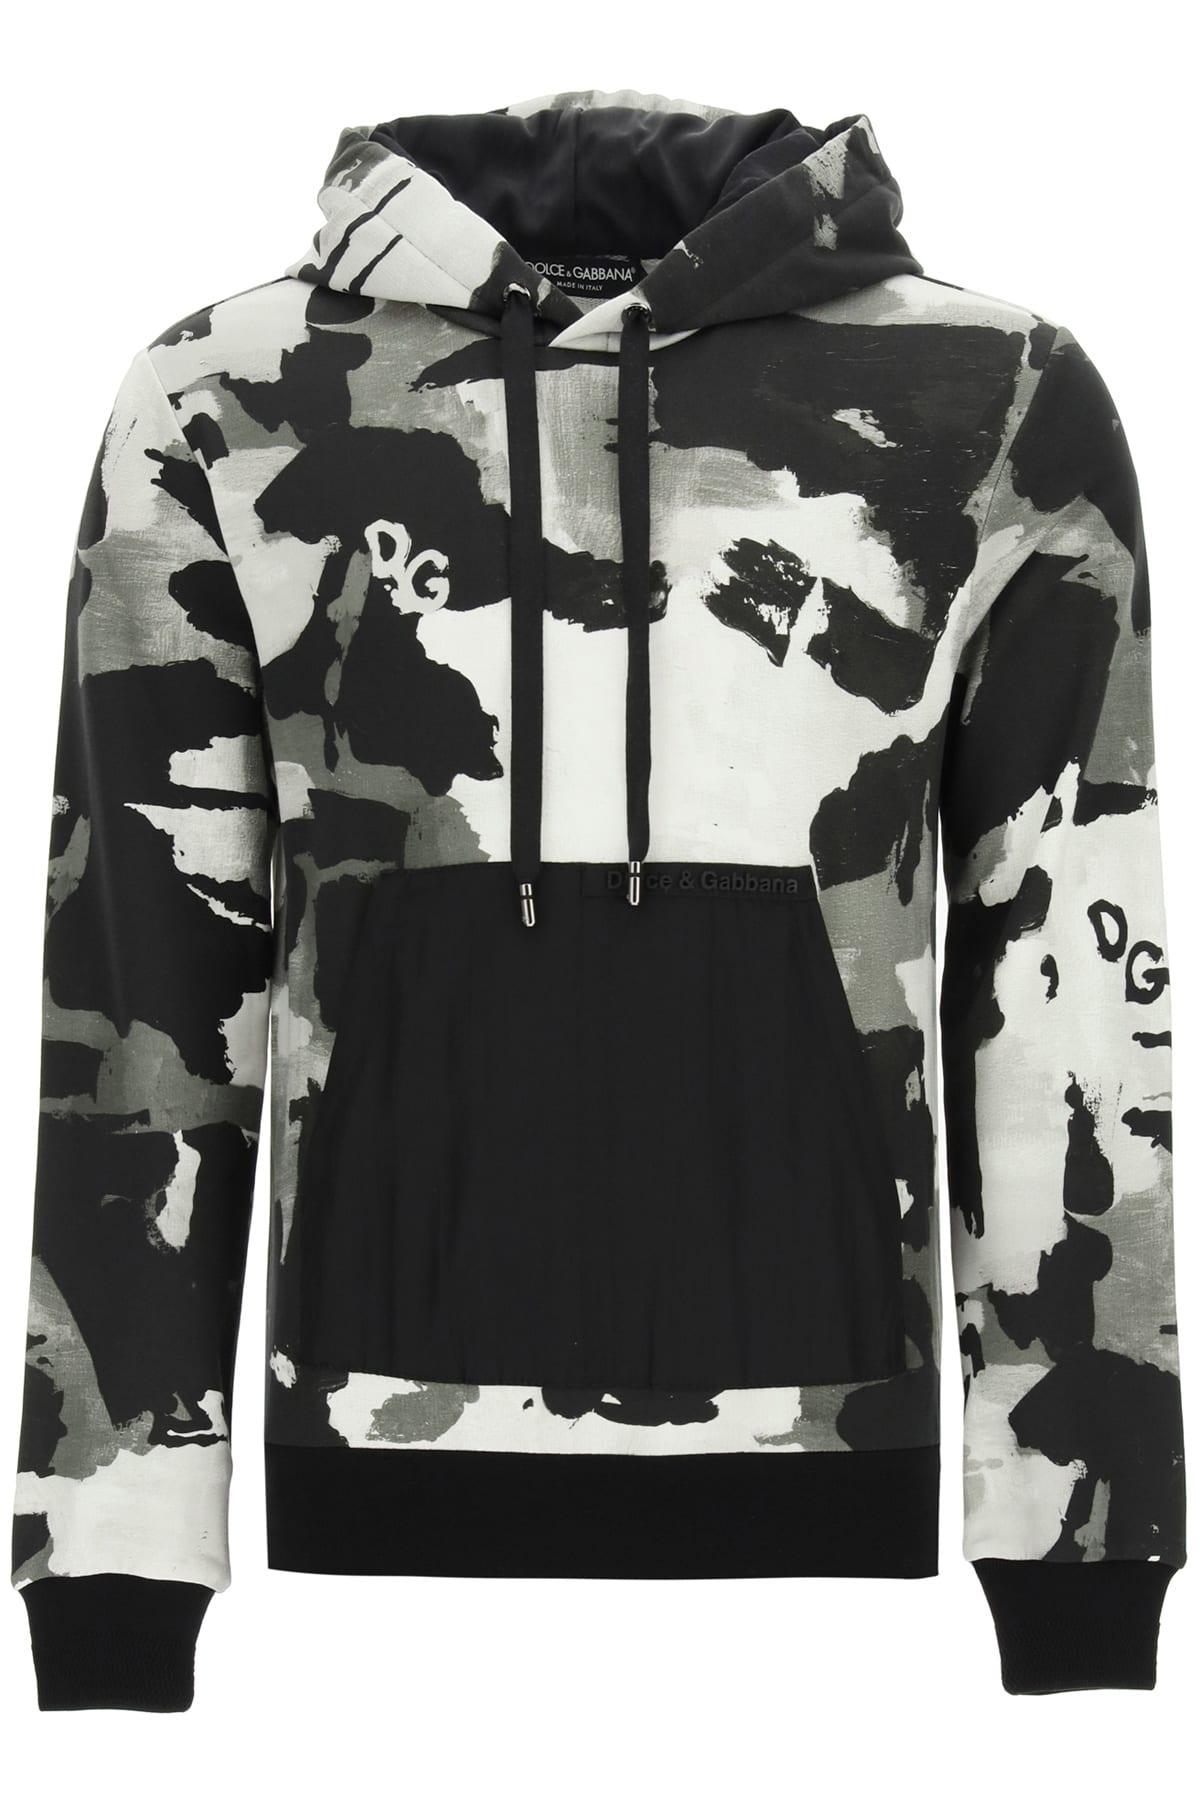 Dolce & Gabbana Camouflage Hoodie